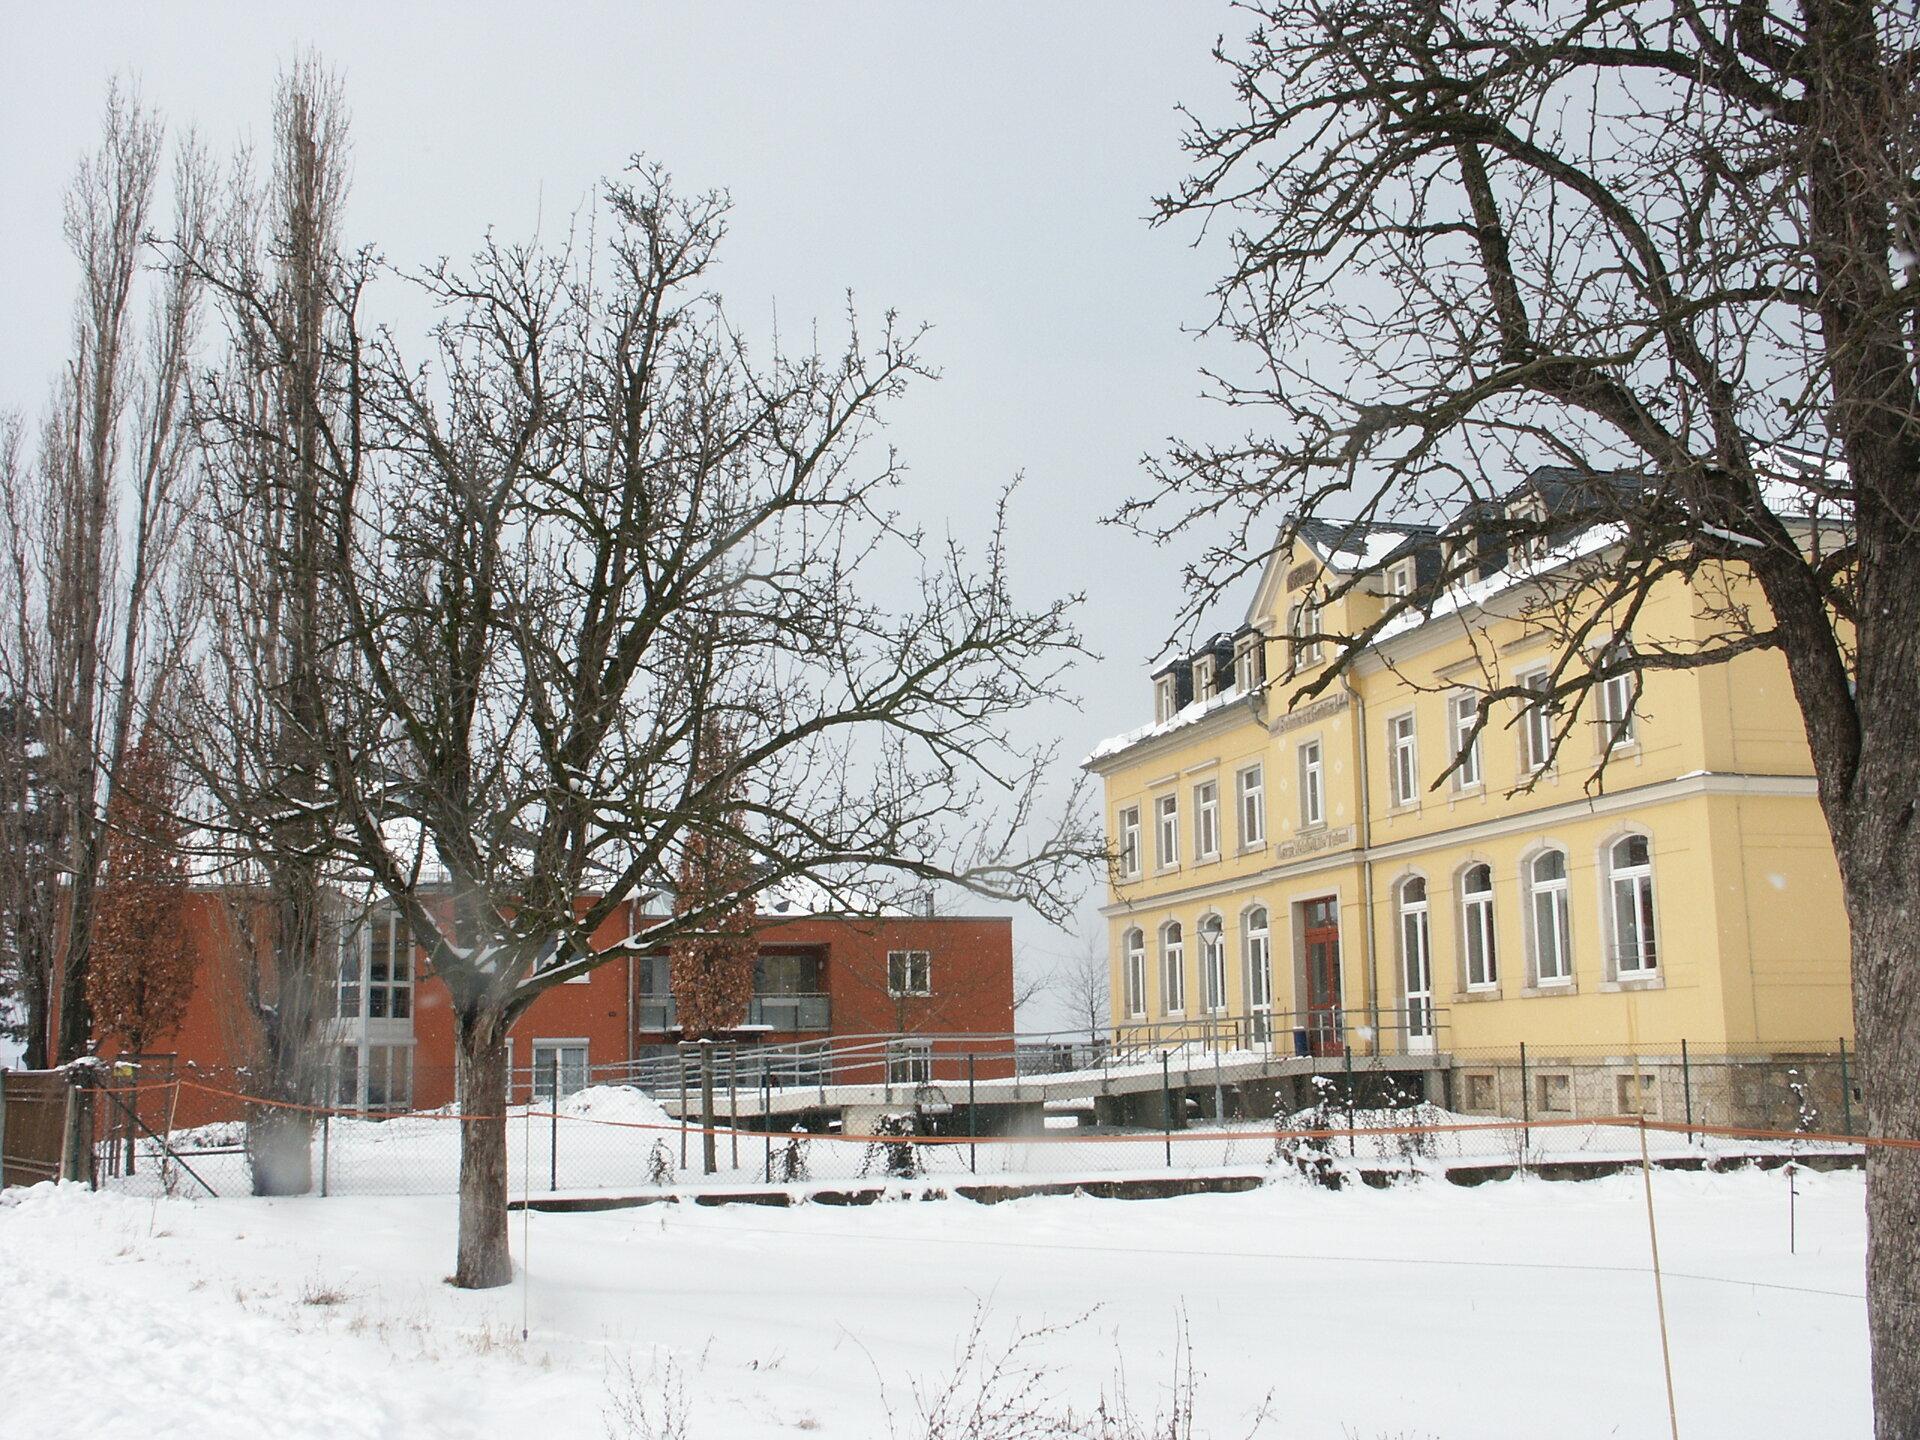 Gohlis im Winter